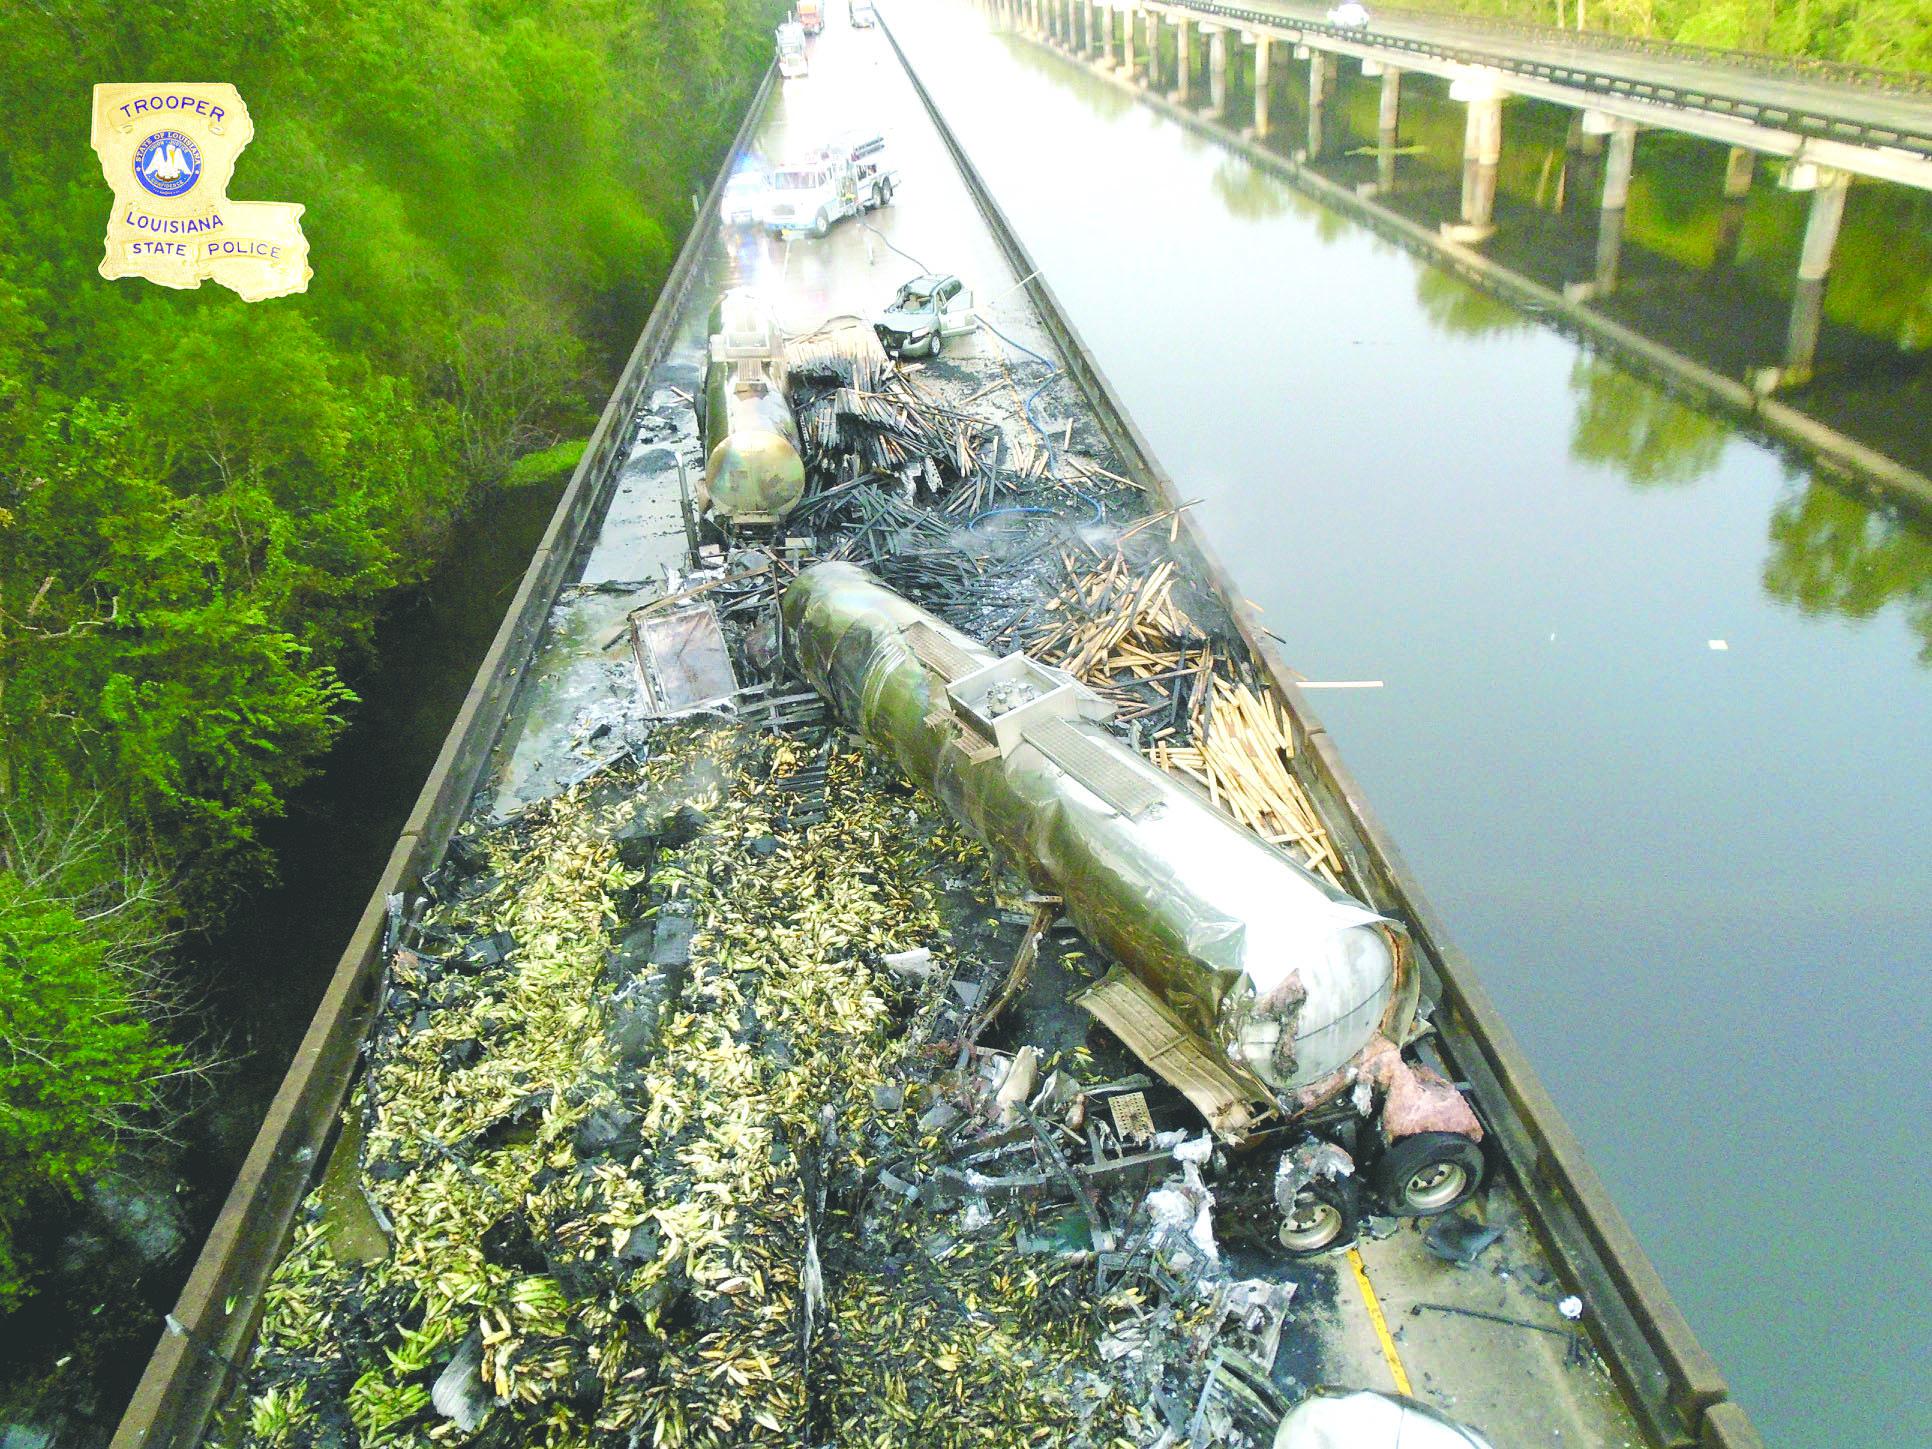 I-10 remains closed after deadly crash | Minden Press-Herald